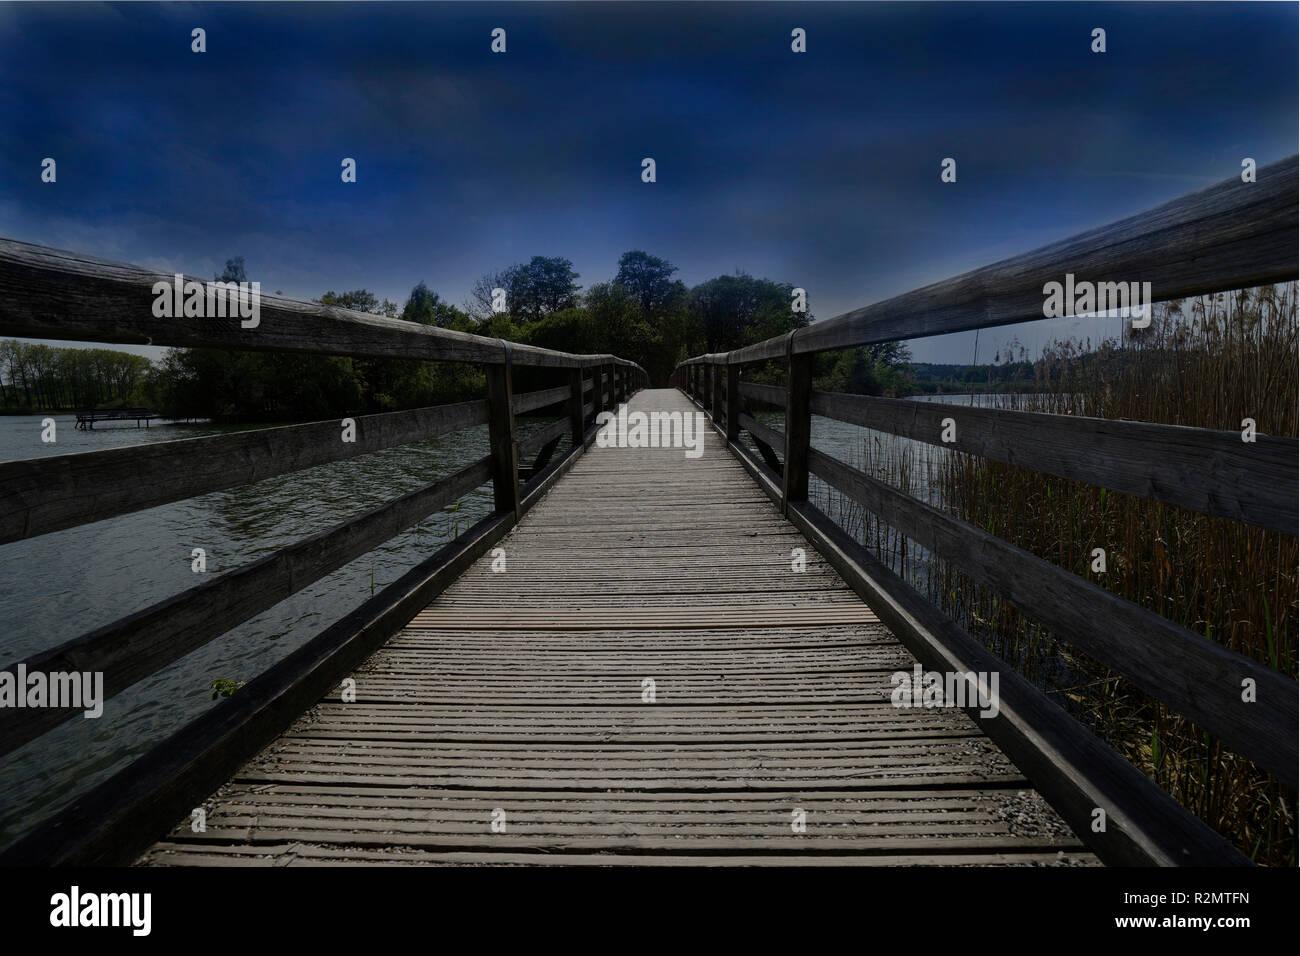 Wooden bridge, pedestrian bridge, waters, deserted, evenings, bleak - Stock Image